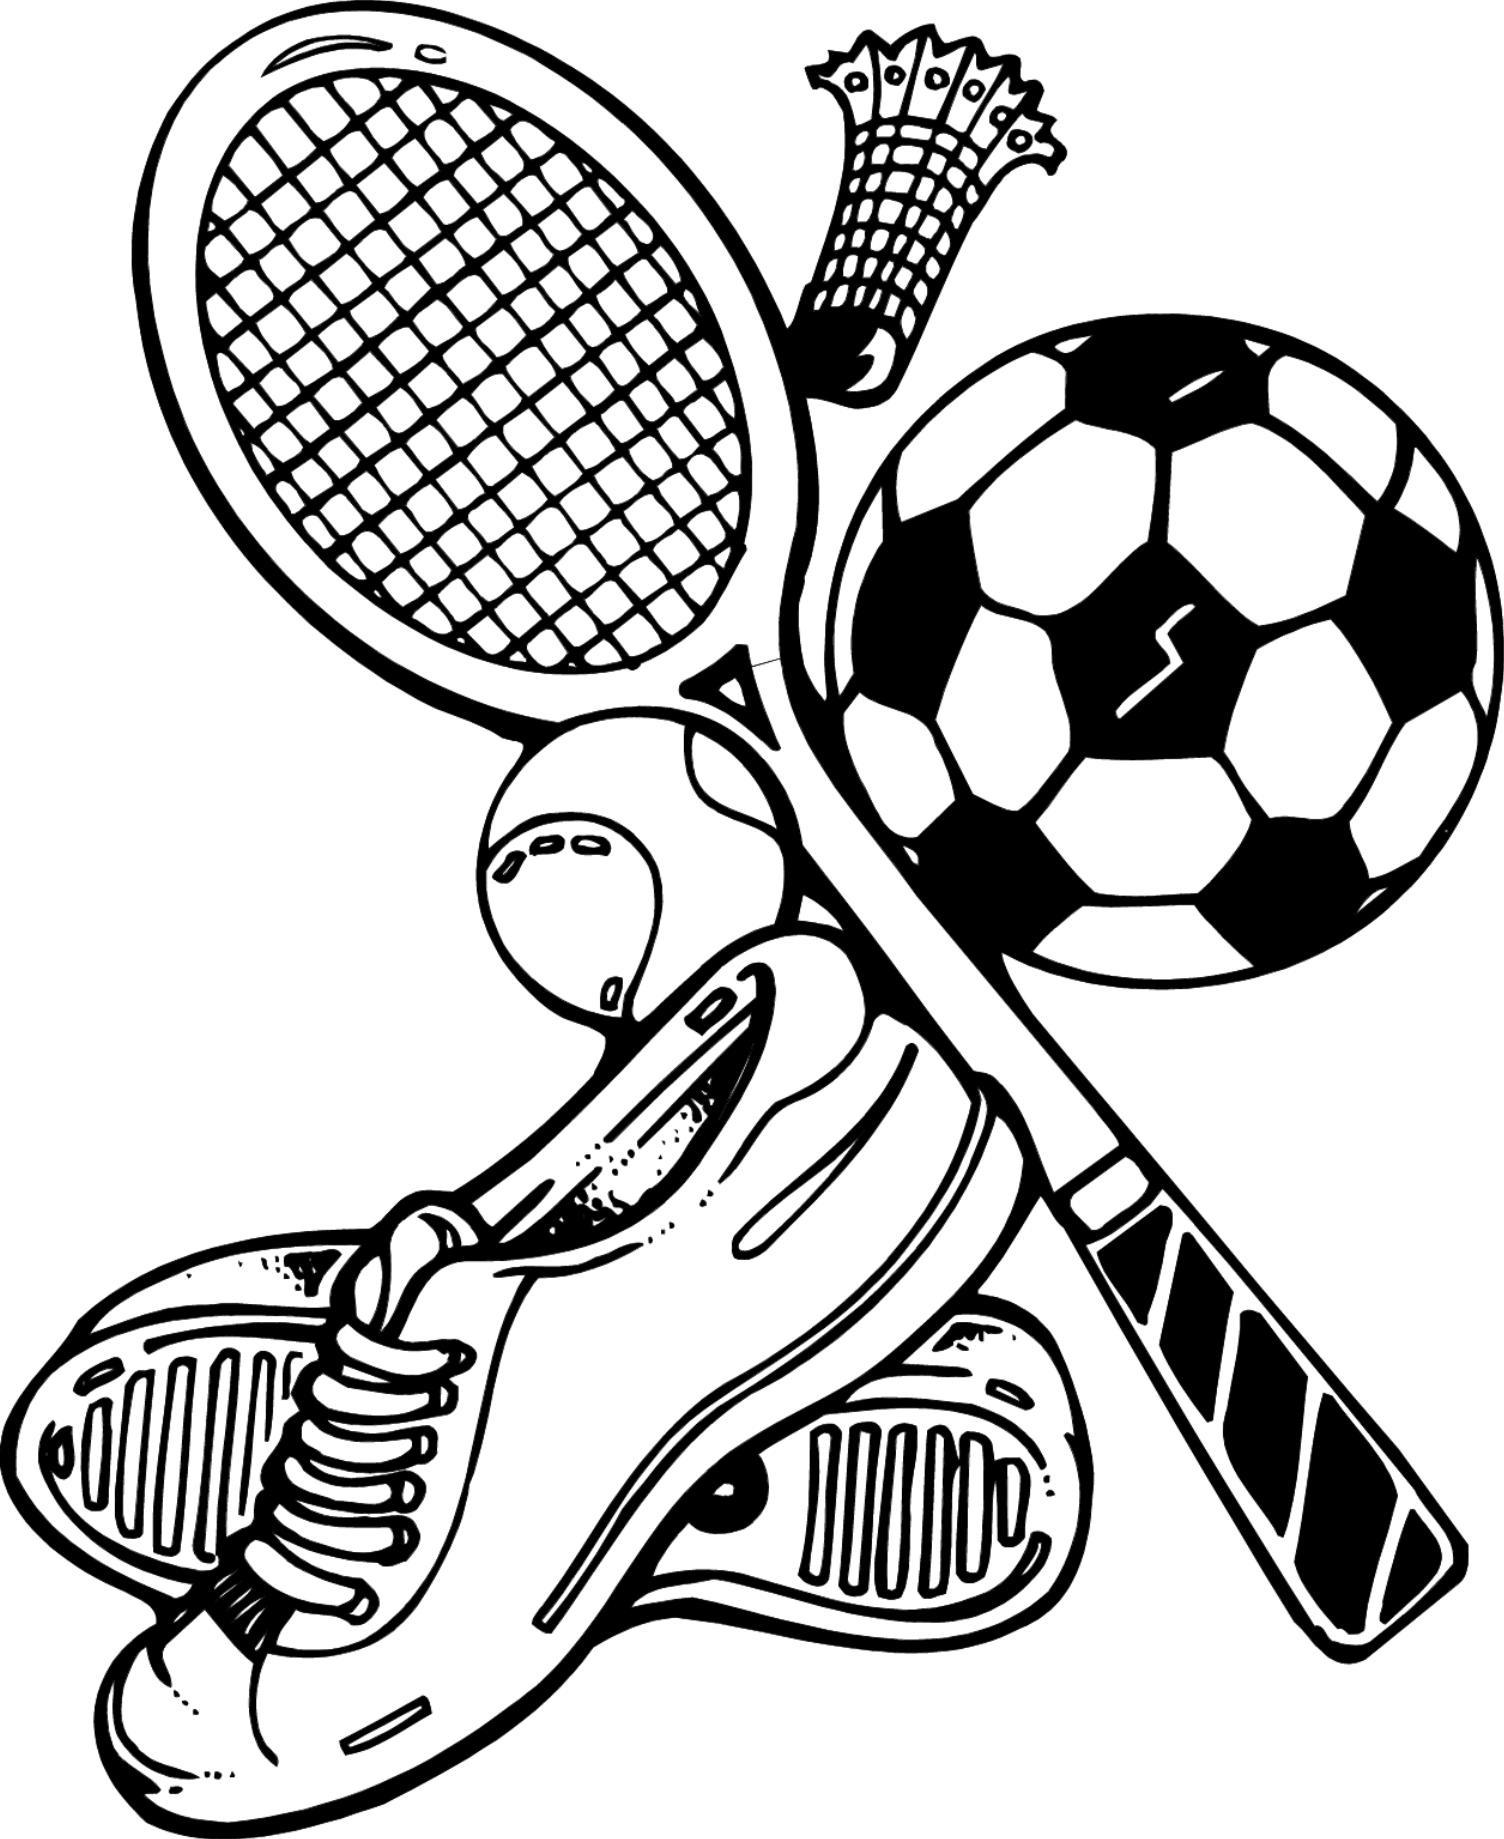 Free Printable Sports Posters. Printable. Free Printable Worksheets - Free Printable Sports Posters